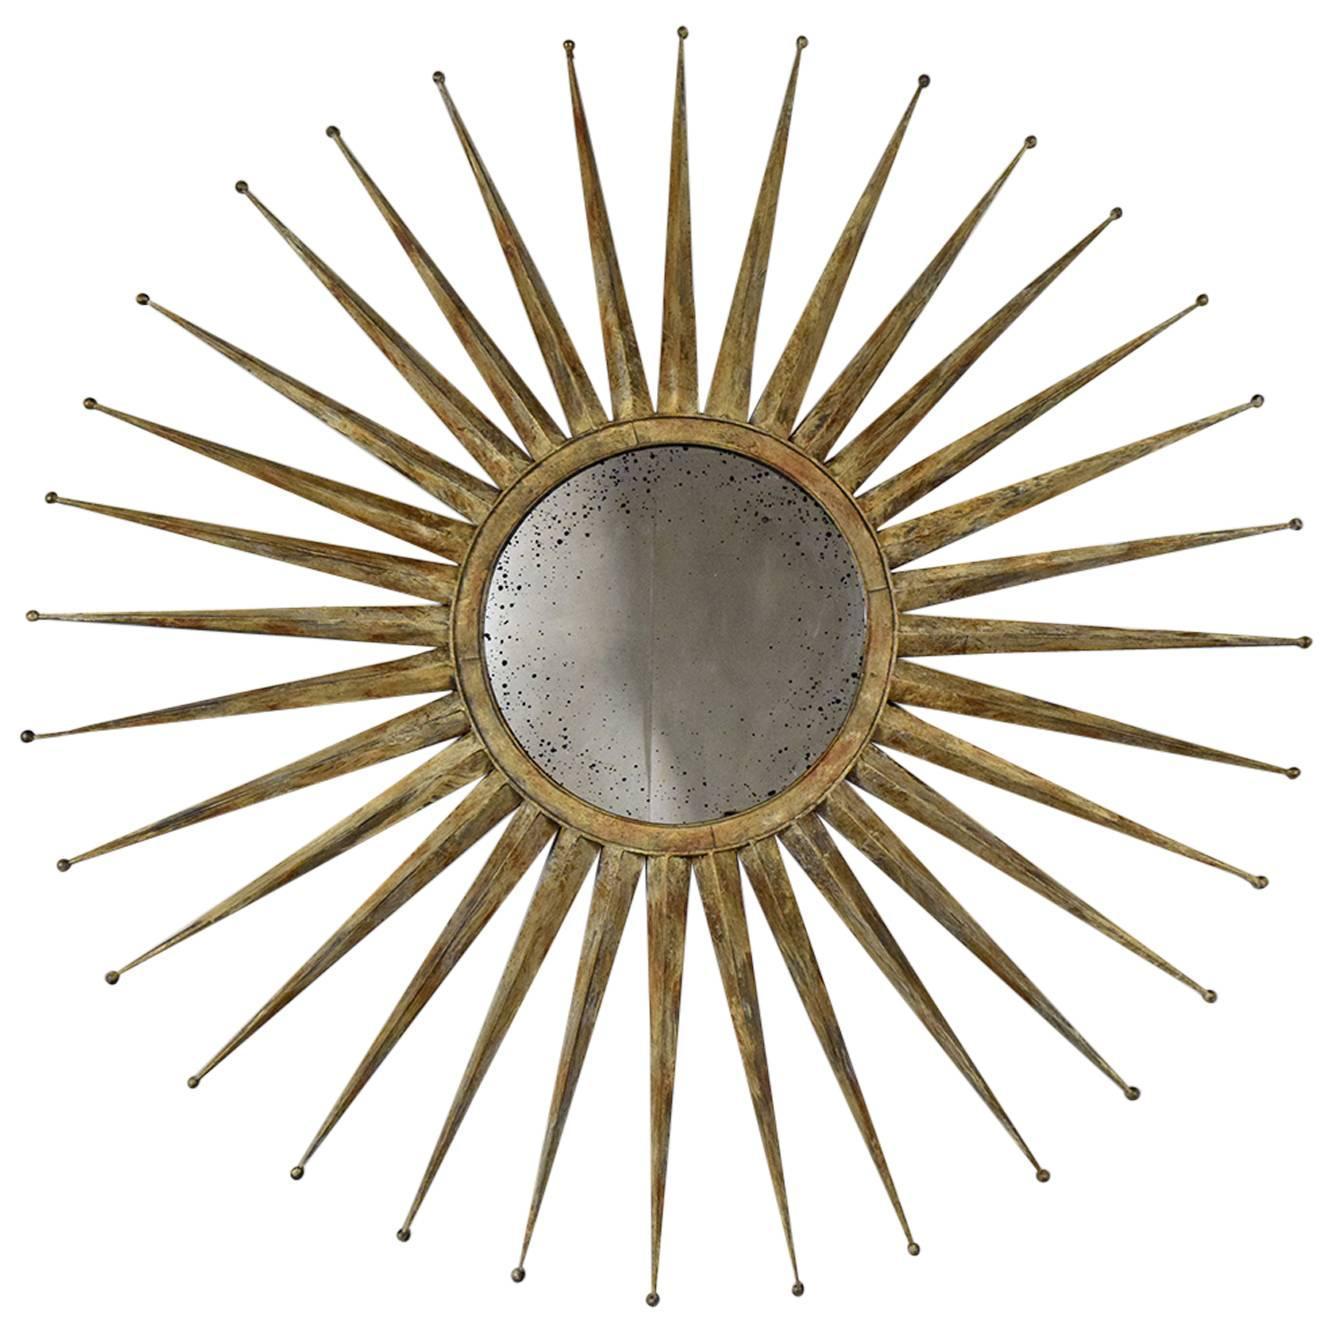 Sunburst distressed finish wall mirror at 1stdibs for Sunburst mirror